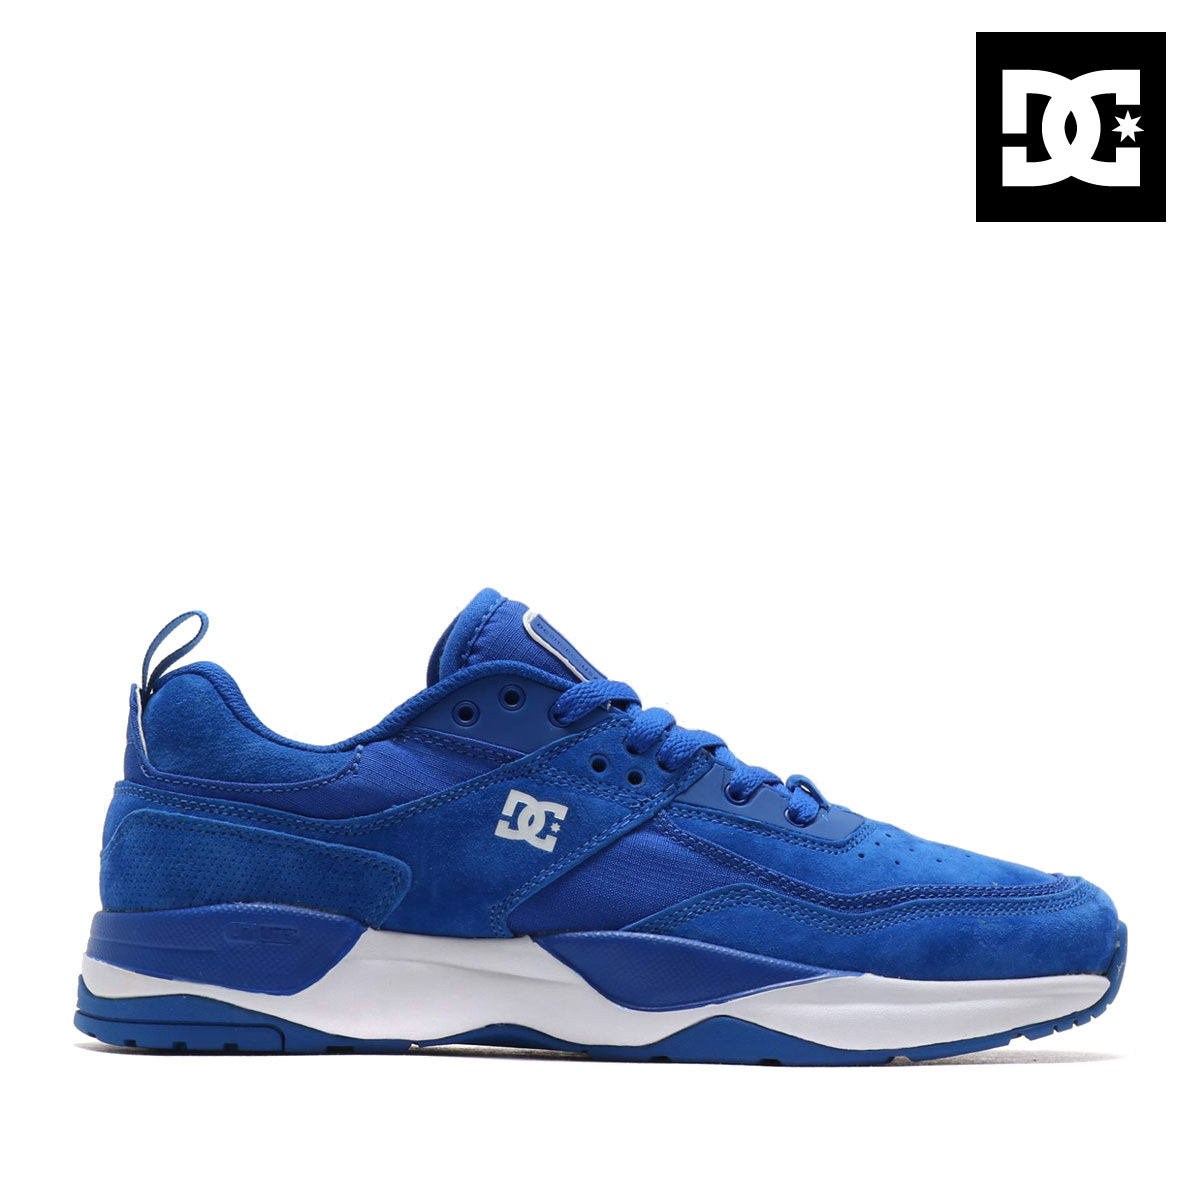 DC SHOES E.TRIBEKA(BLUE)(ディーシーシューズ イー・トライベッカ)【メンズサイズ】【スニーカー】【18FA-I】